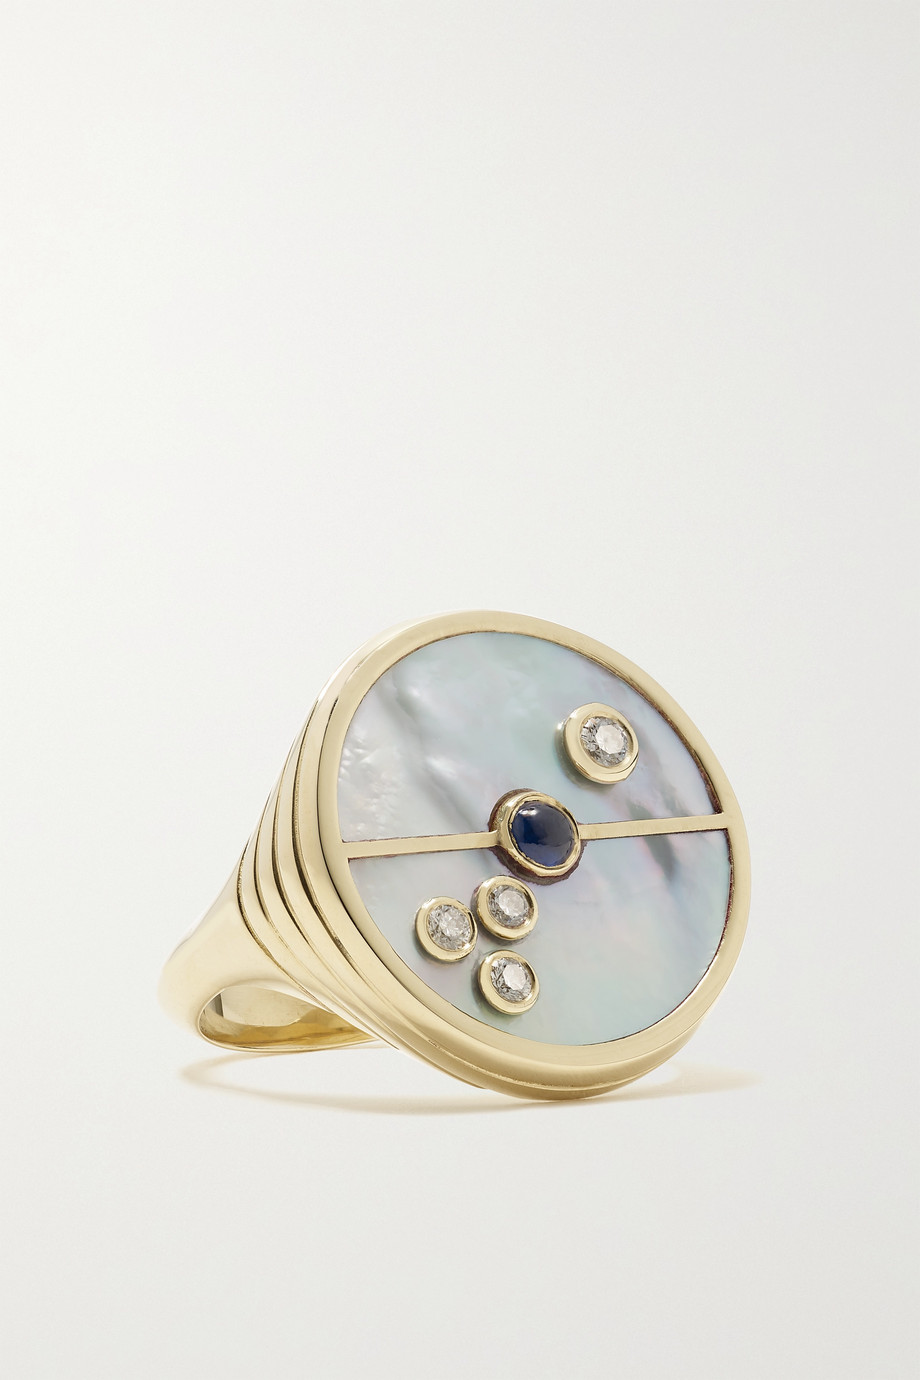 Retrouvaí Compass 14-karat gold multi-stone ring